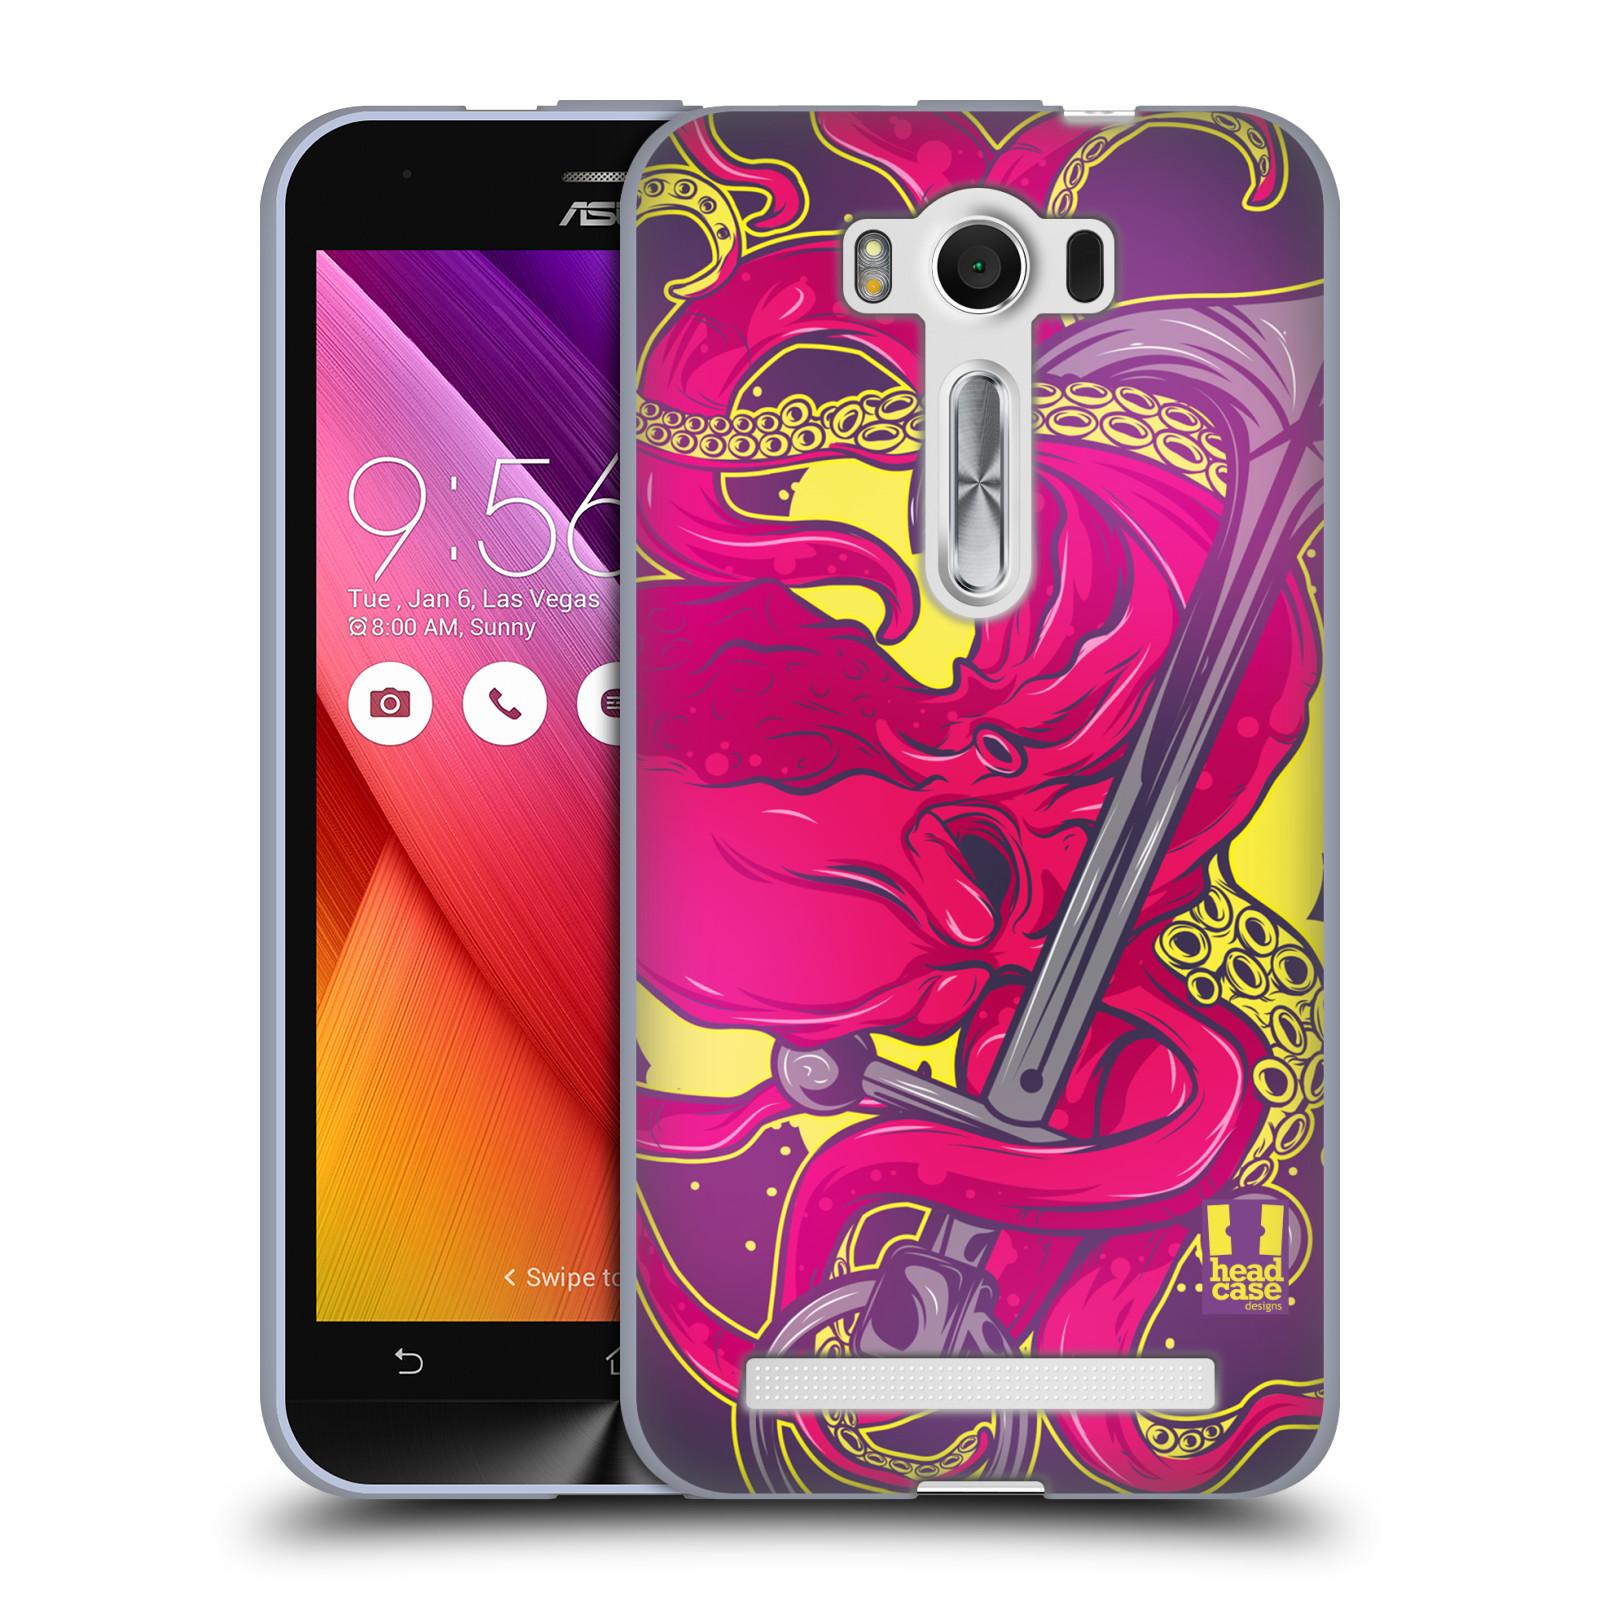 "HEAD CASE silikonový obal na mobil Asus Zenfone 2 LASER (ZE500KL s 5"" displejem) vzor mořská monstra chobotnice"